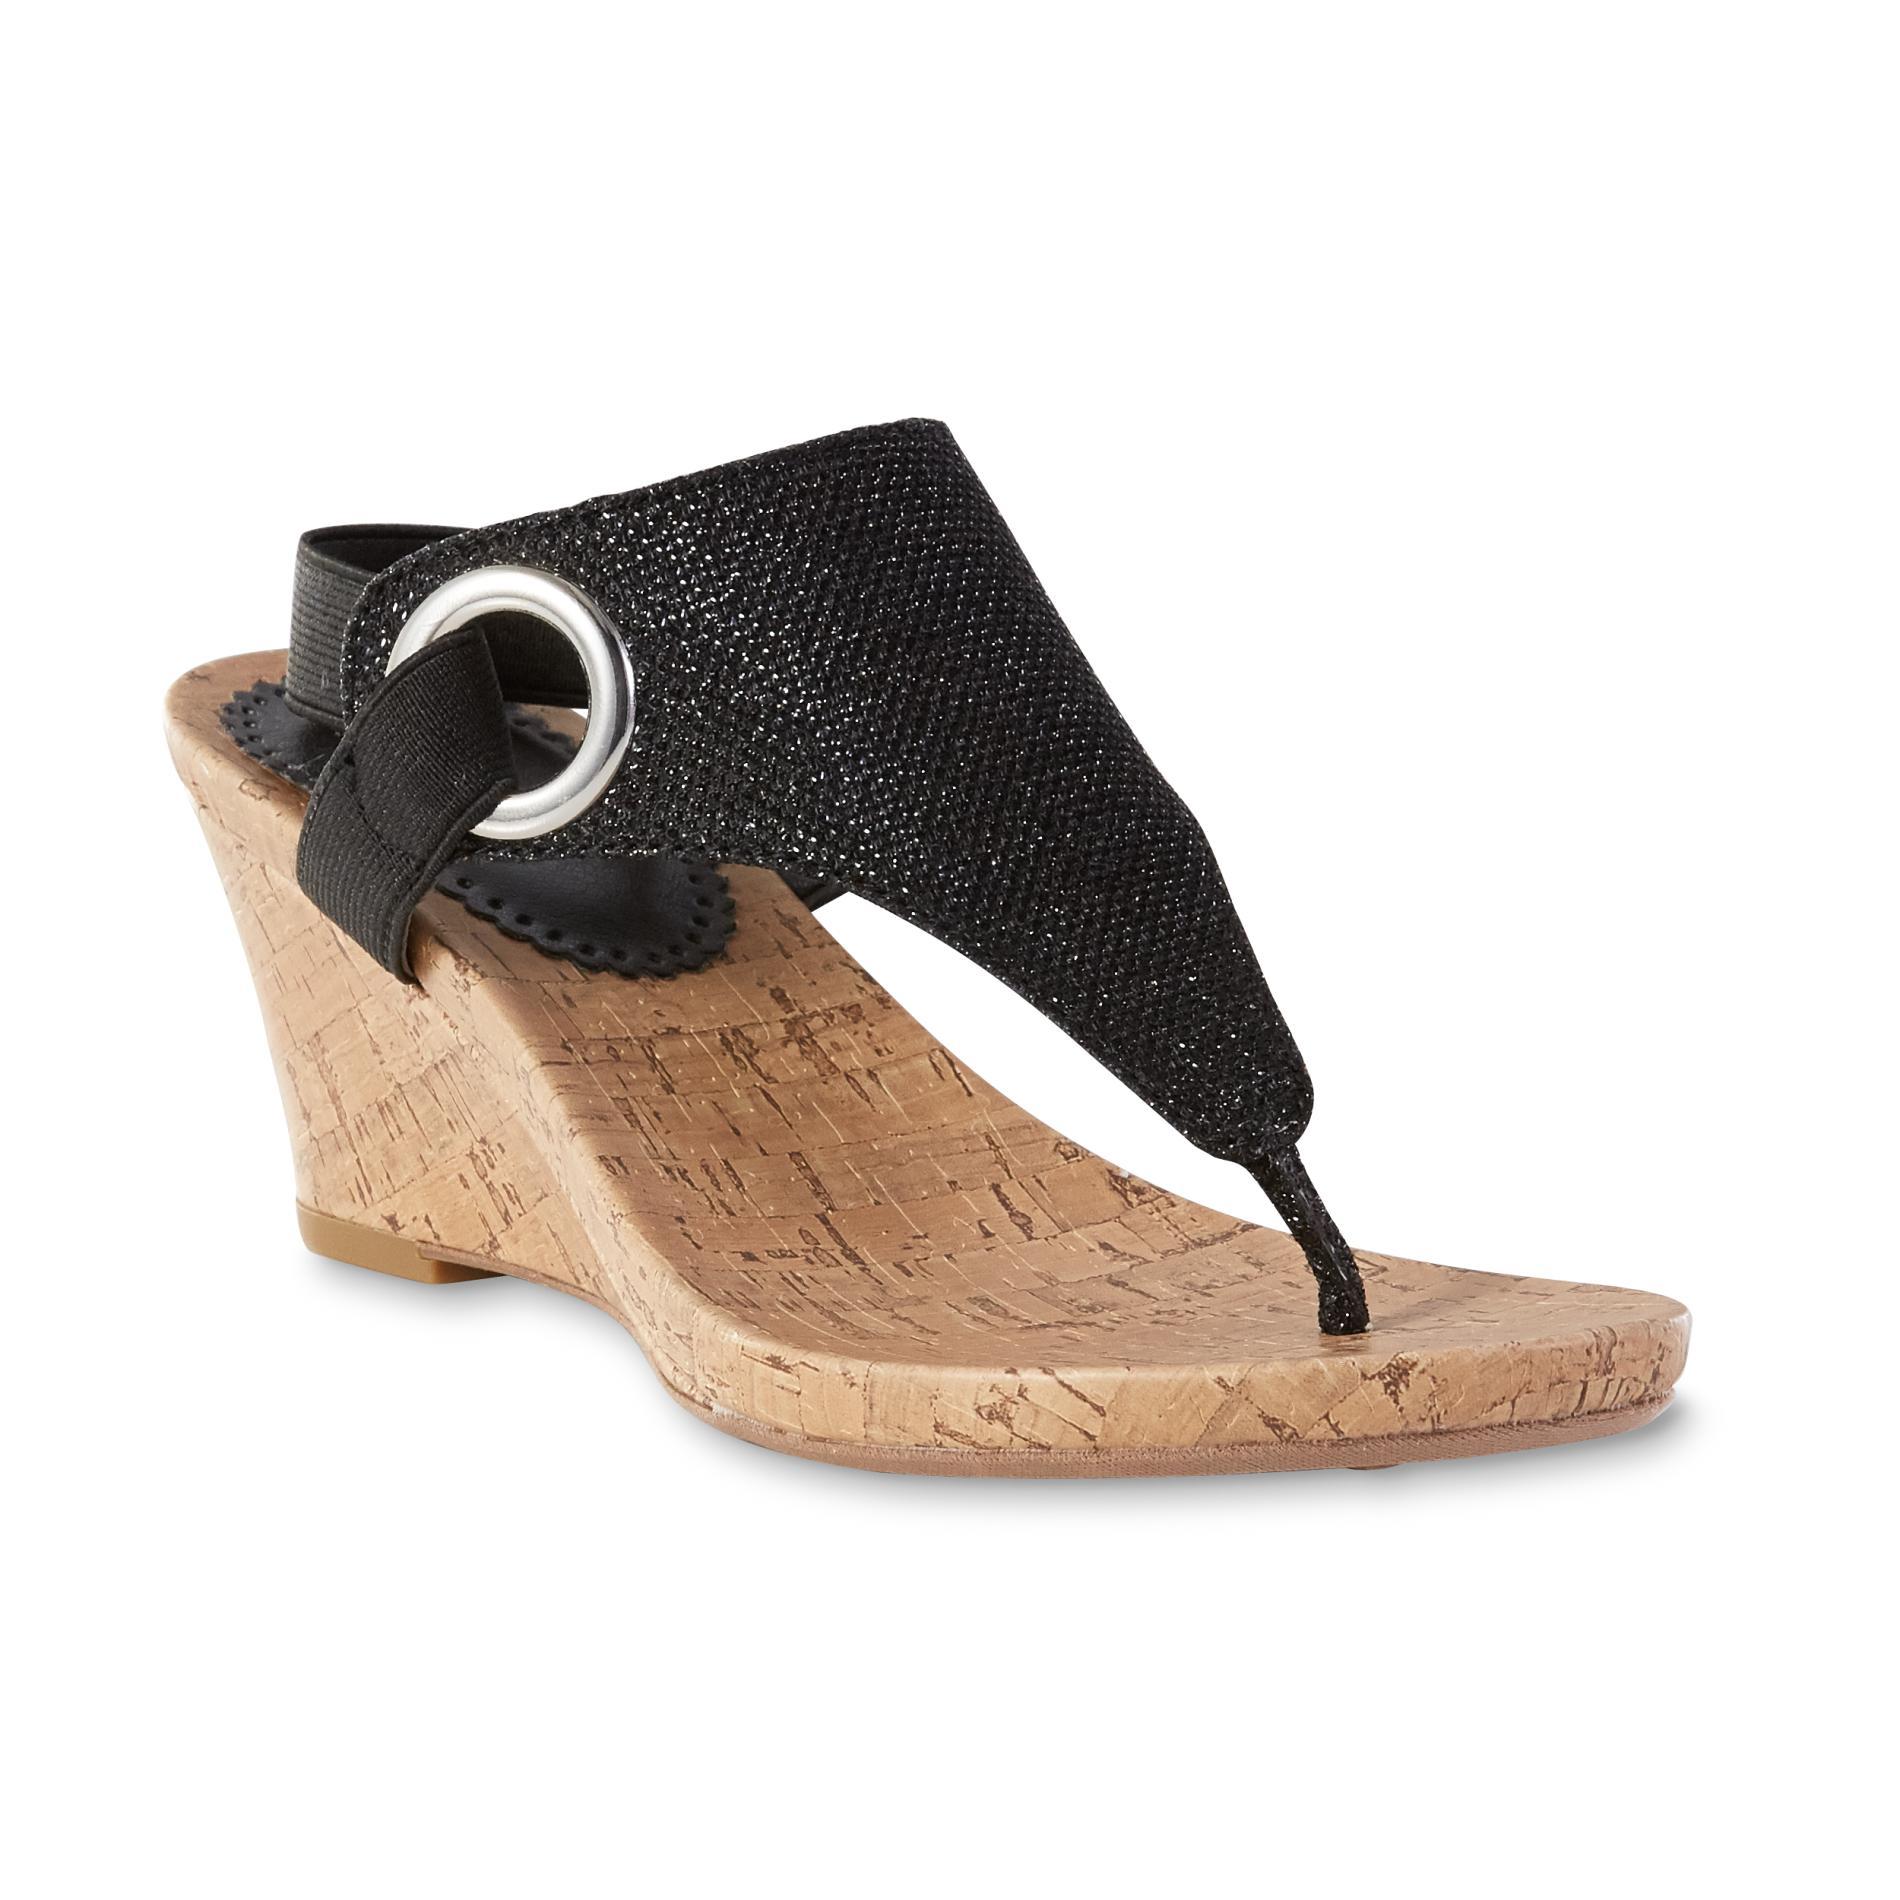 Women's sandals at kmart - Attention Women S Maya Sandal Black Shoes Women S Shoes Women S Sandals